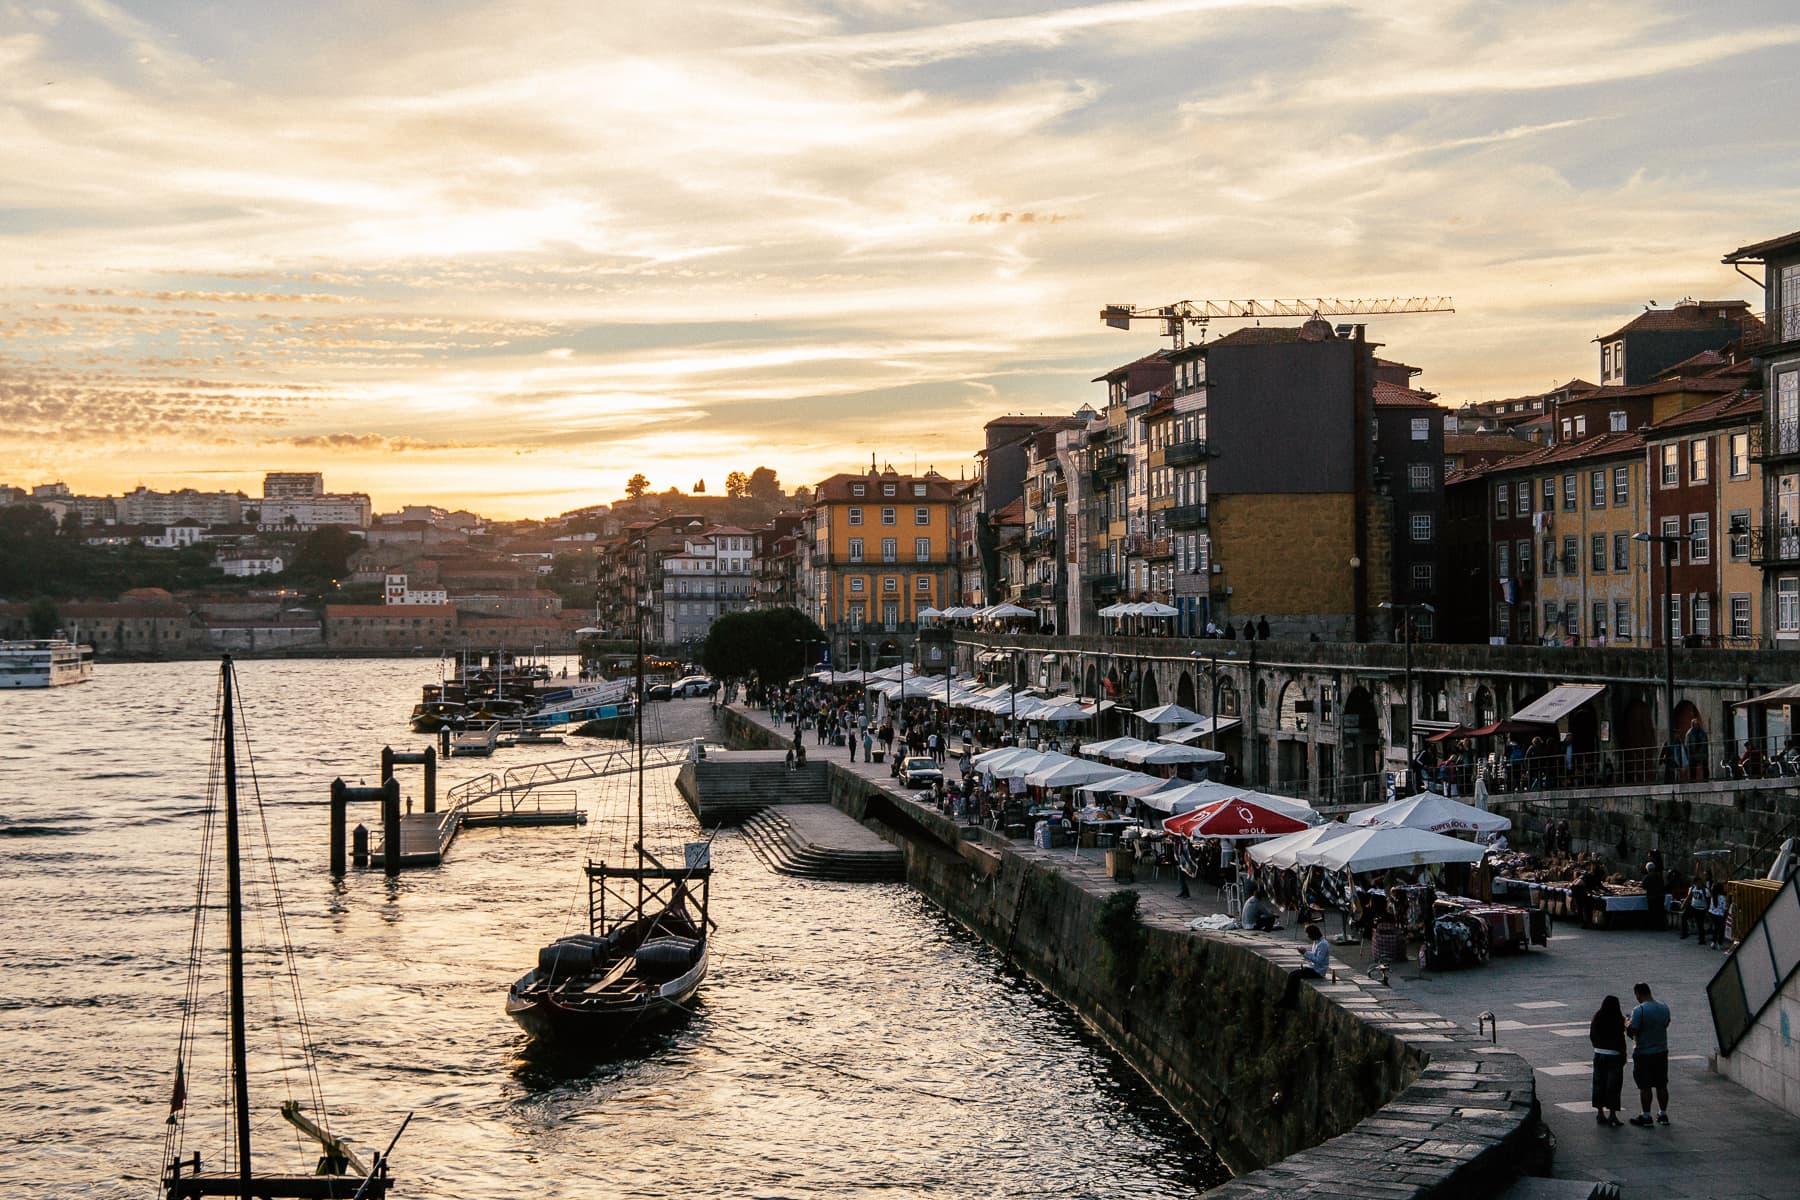 zehn-porto-tipps-fuer-deine-staedtereise-in-portugal-reiseblog-des-belles-choses 27